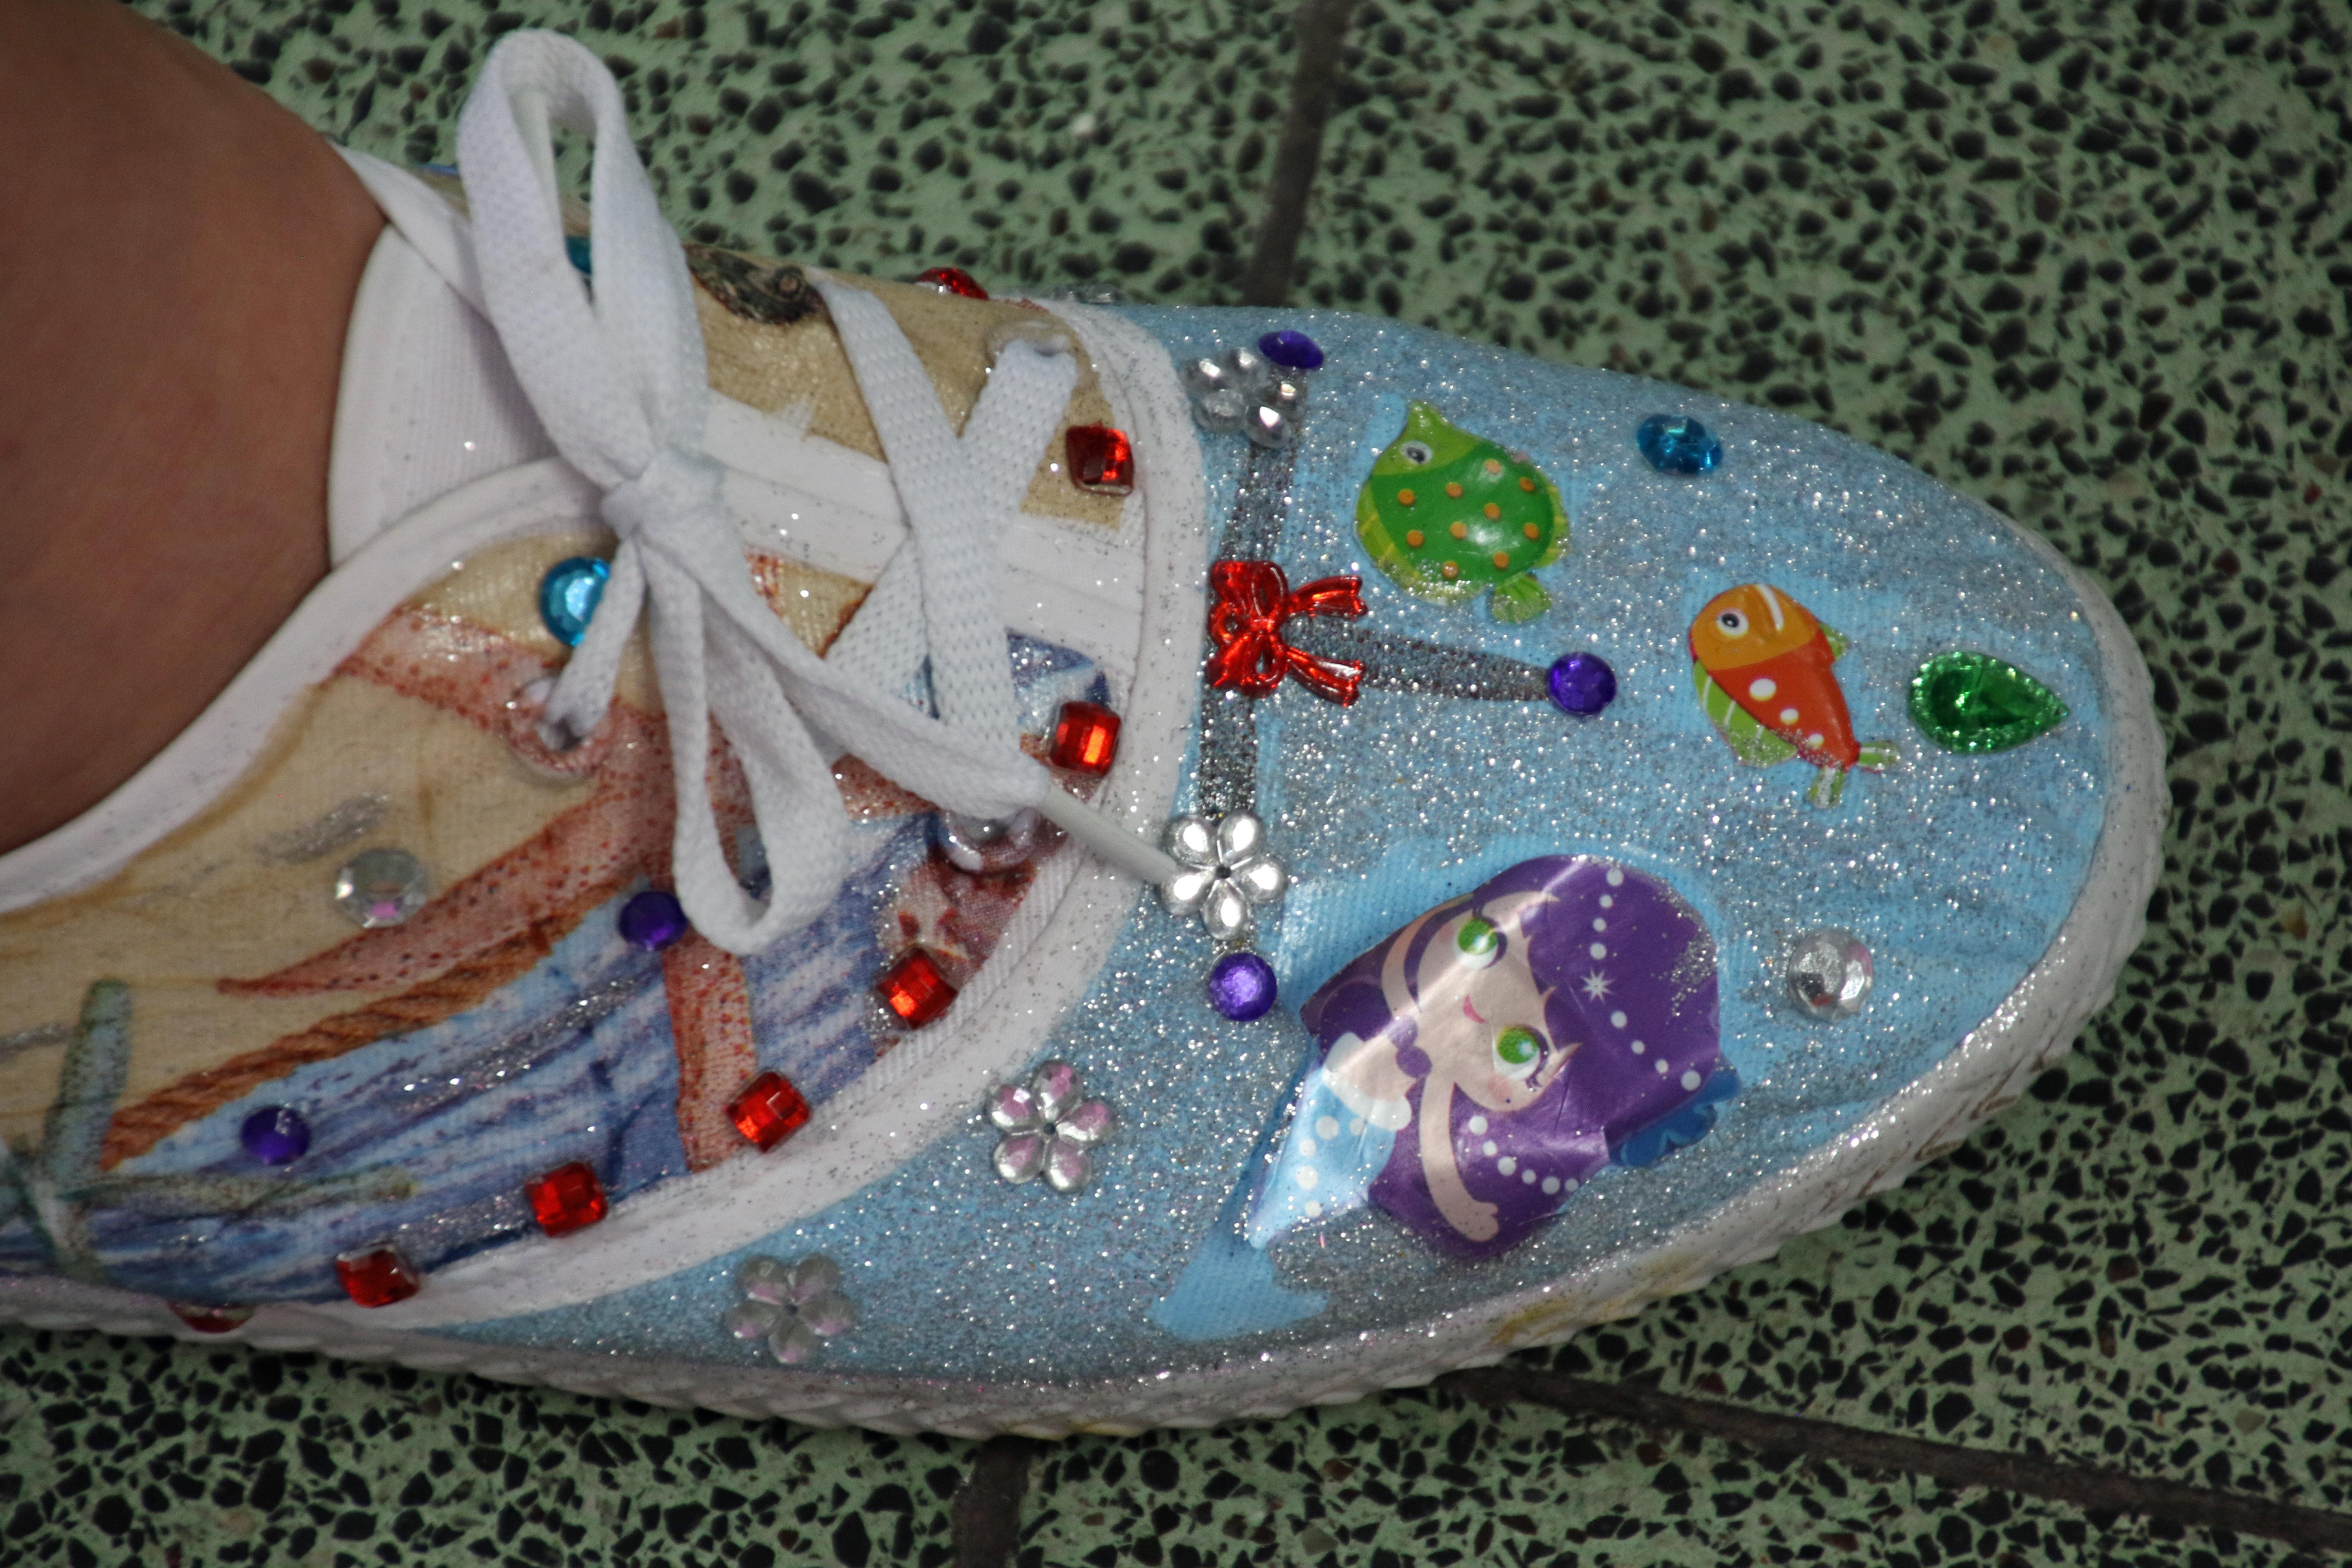 Colourful female shoe, Colourful female shoe